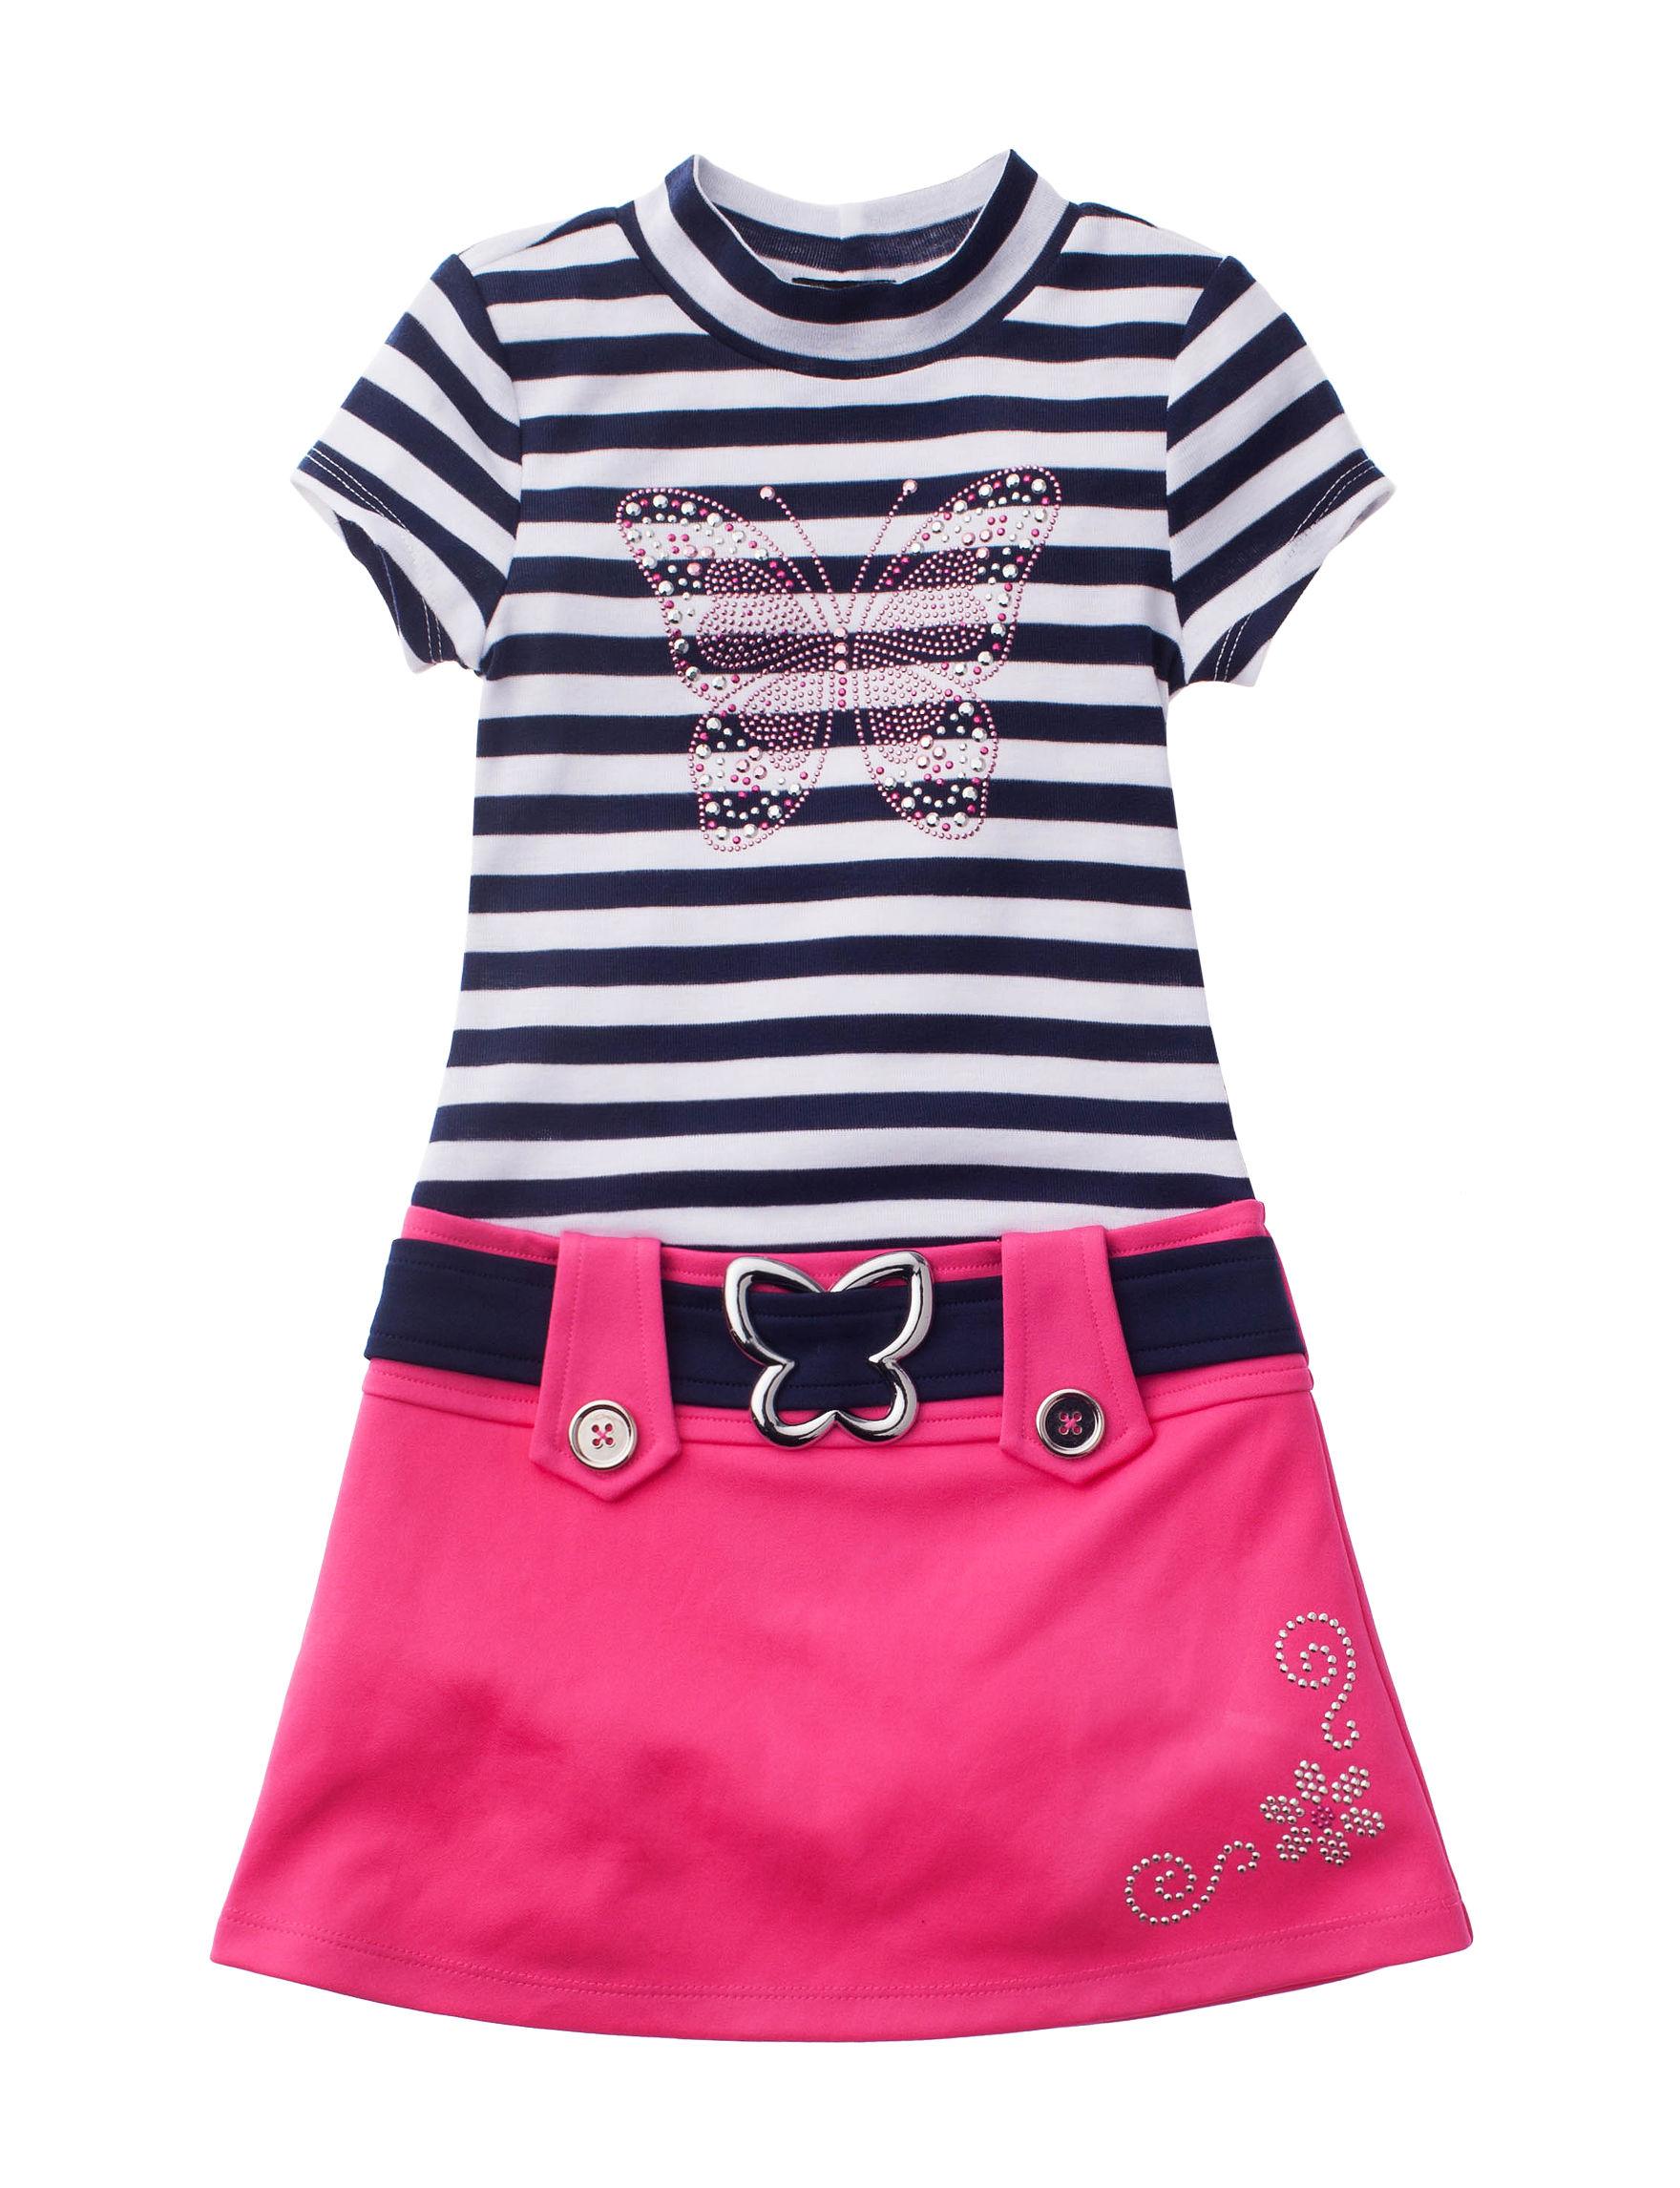 Lilt Pink / Navy / White